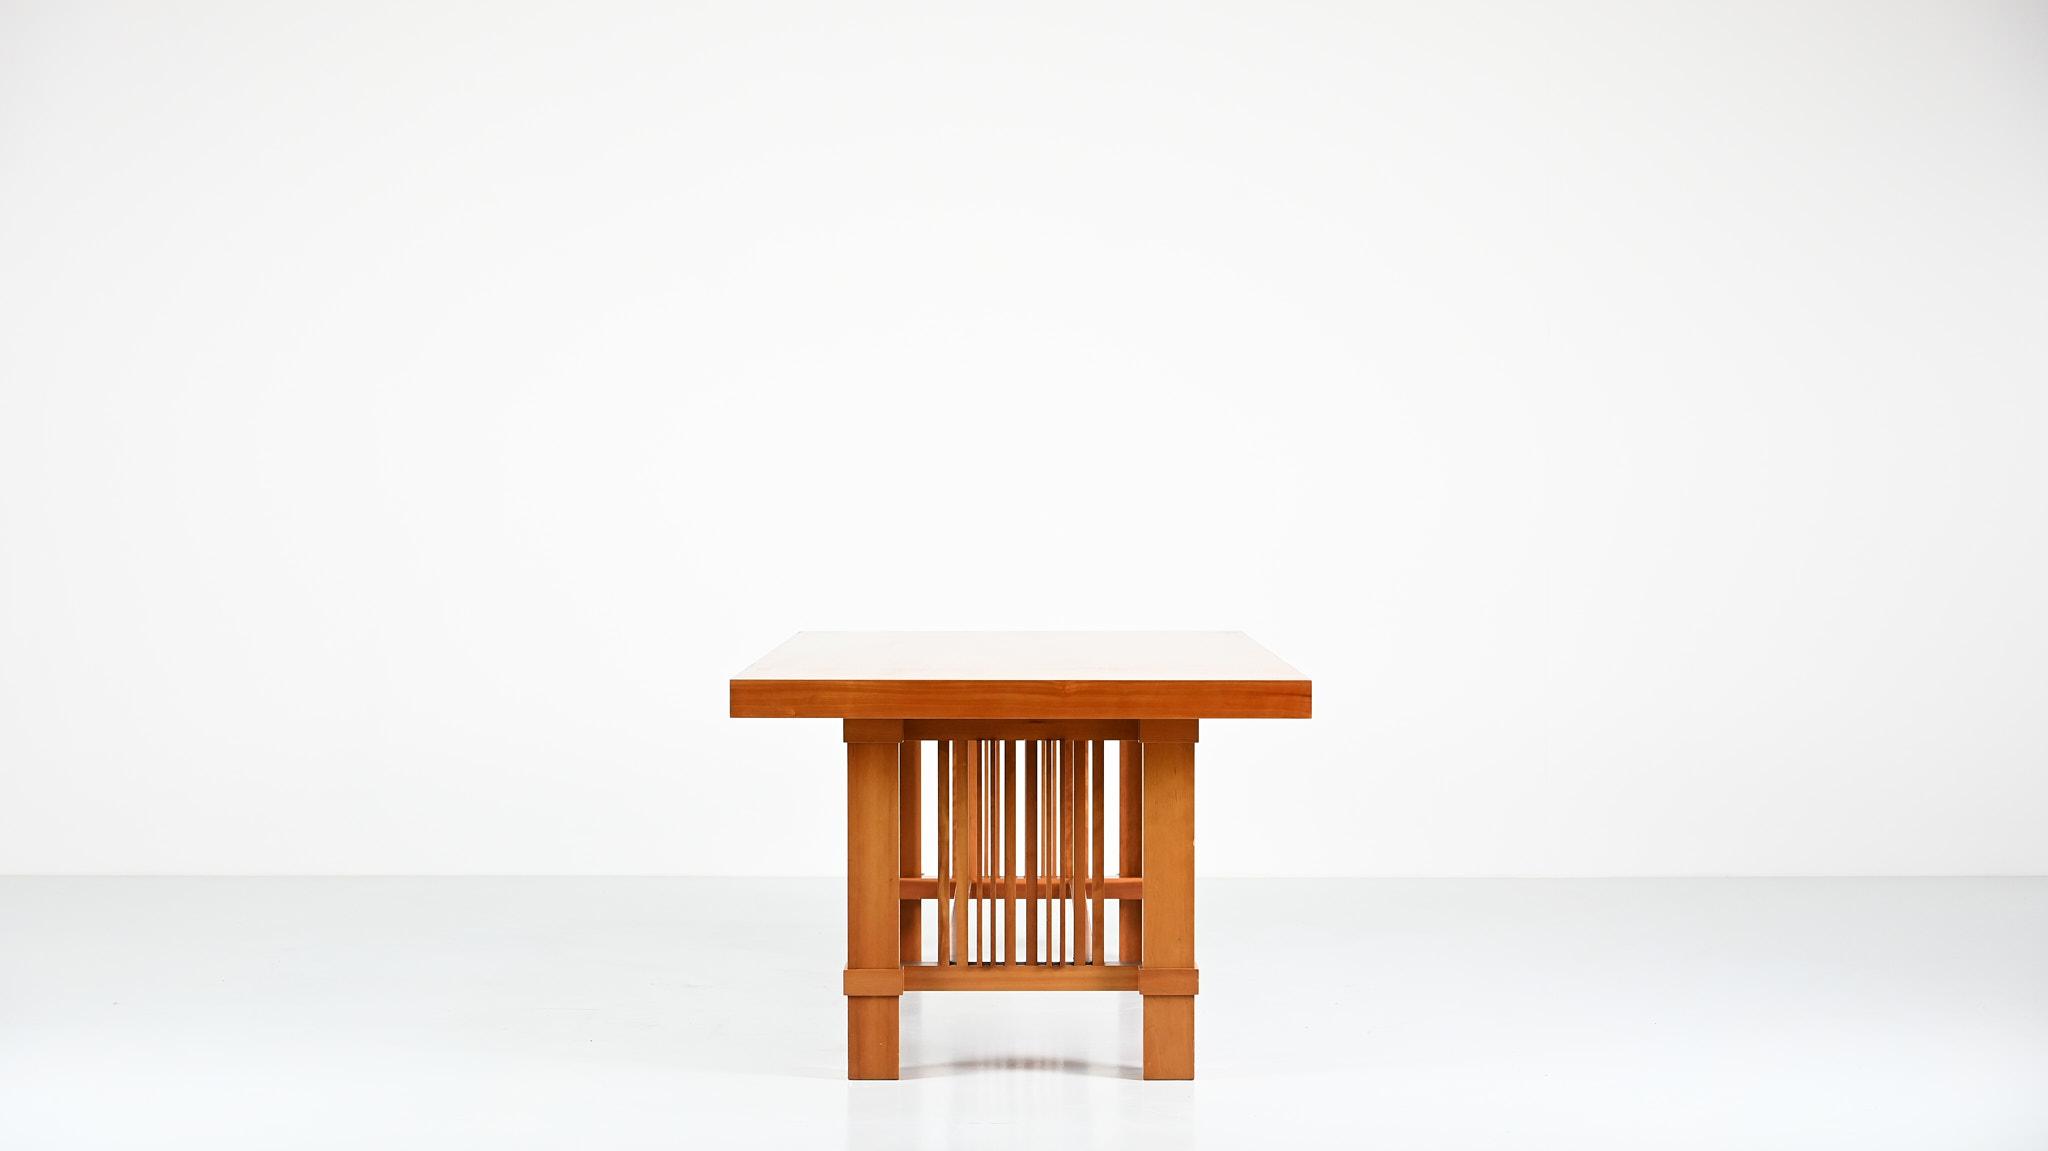 taliesin cassina table frank lloyd wright modernism design prairie style allen architecture